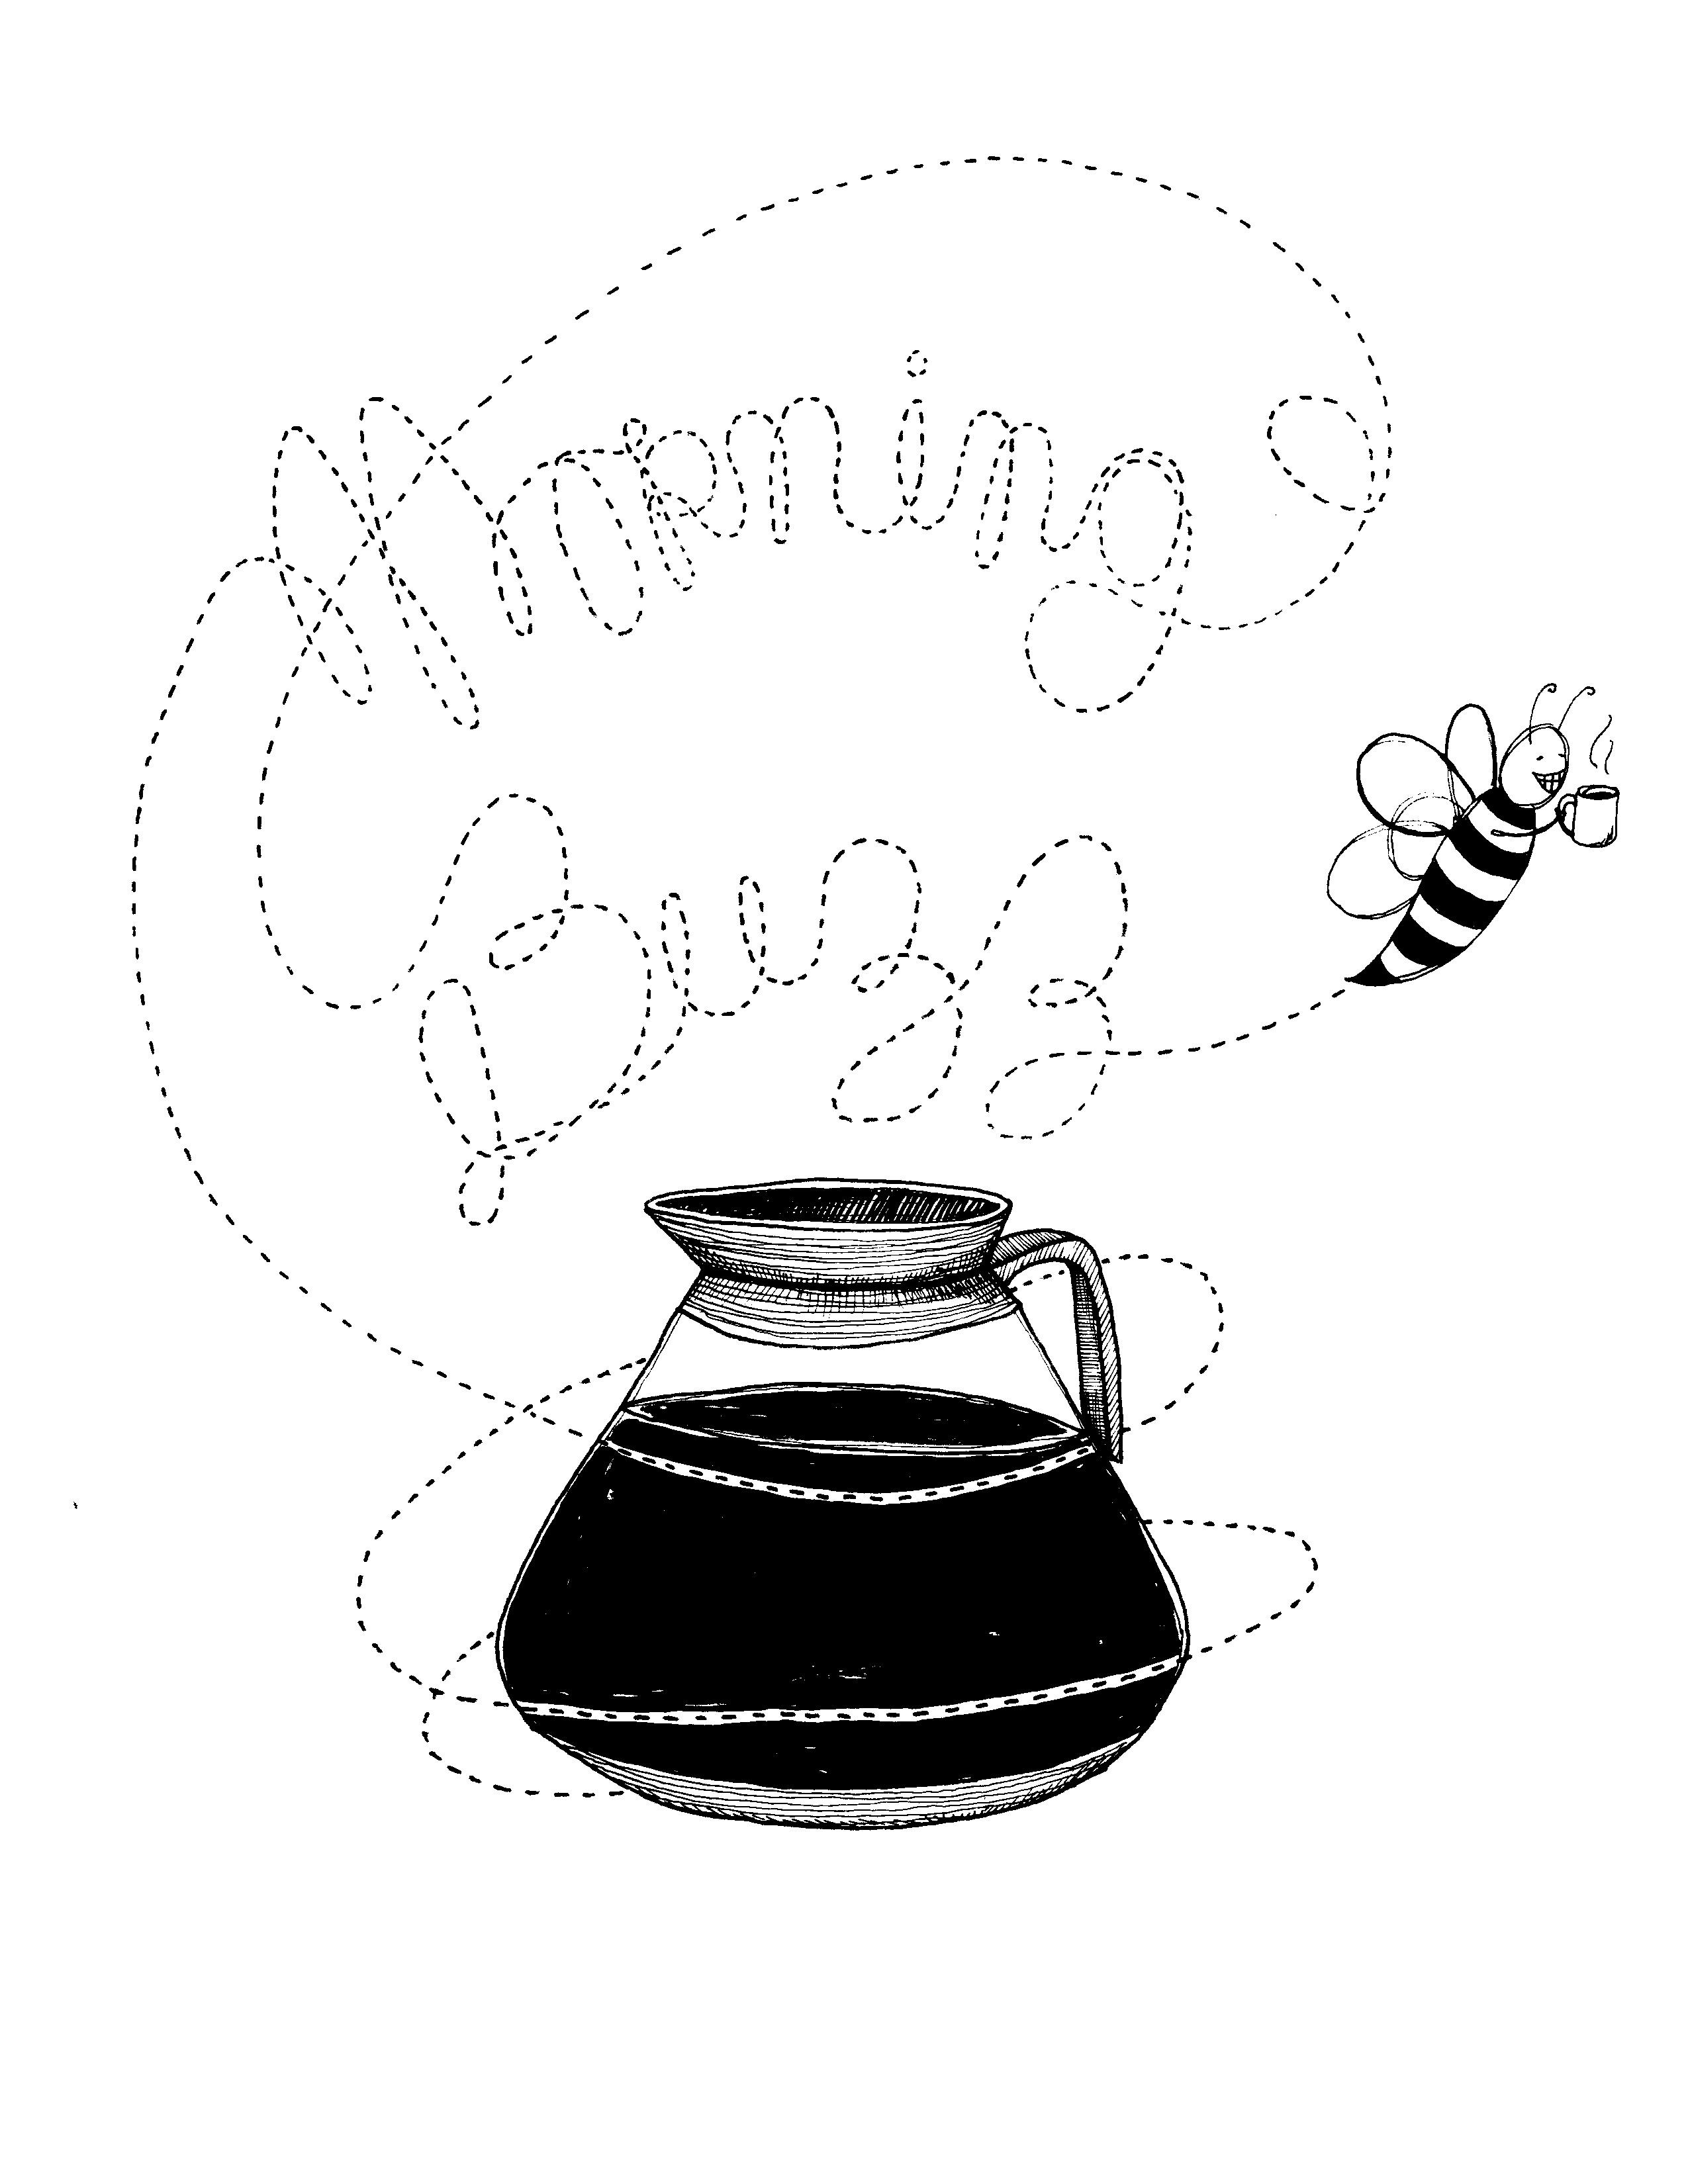 Morning buzz final